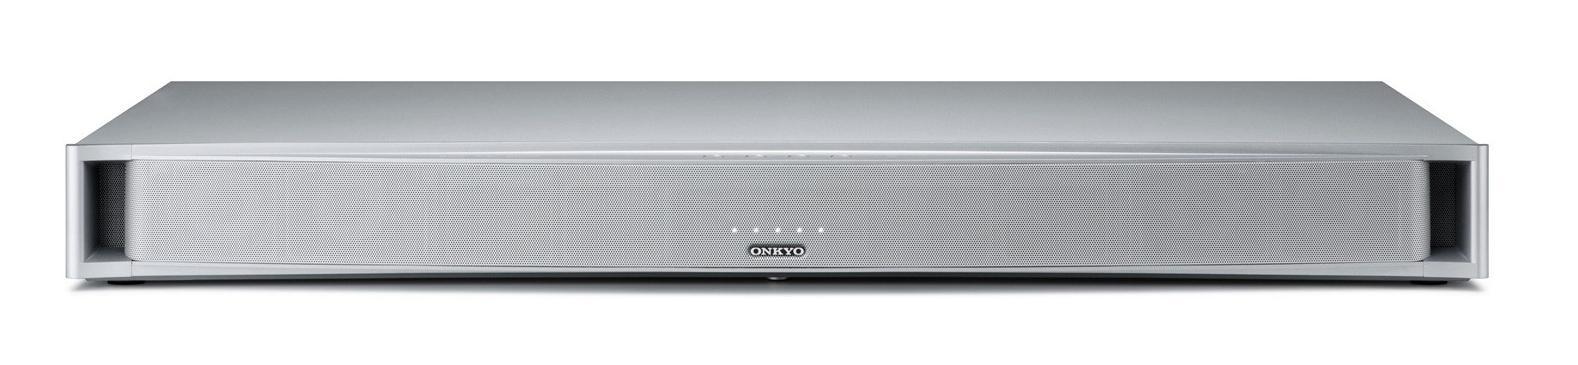 Onkyo LS-T30 (25566) - акустическая платформа (Silver)